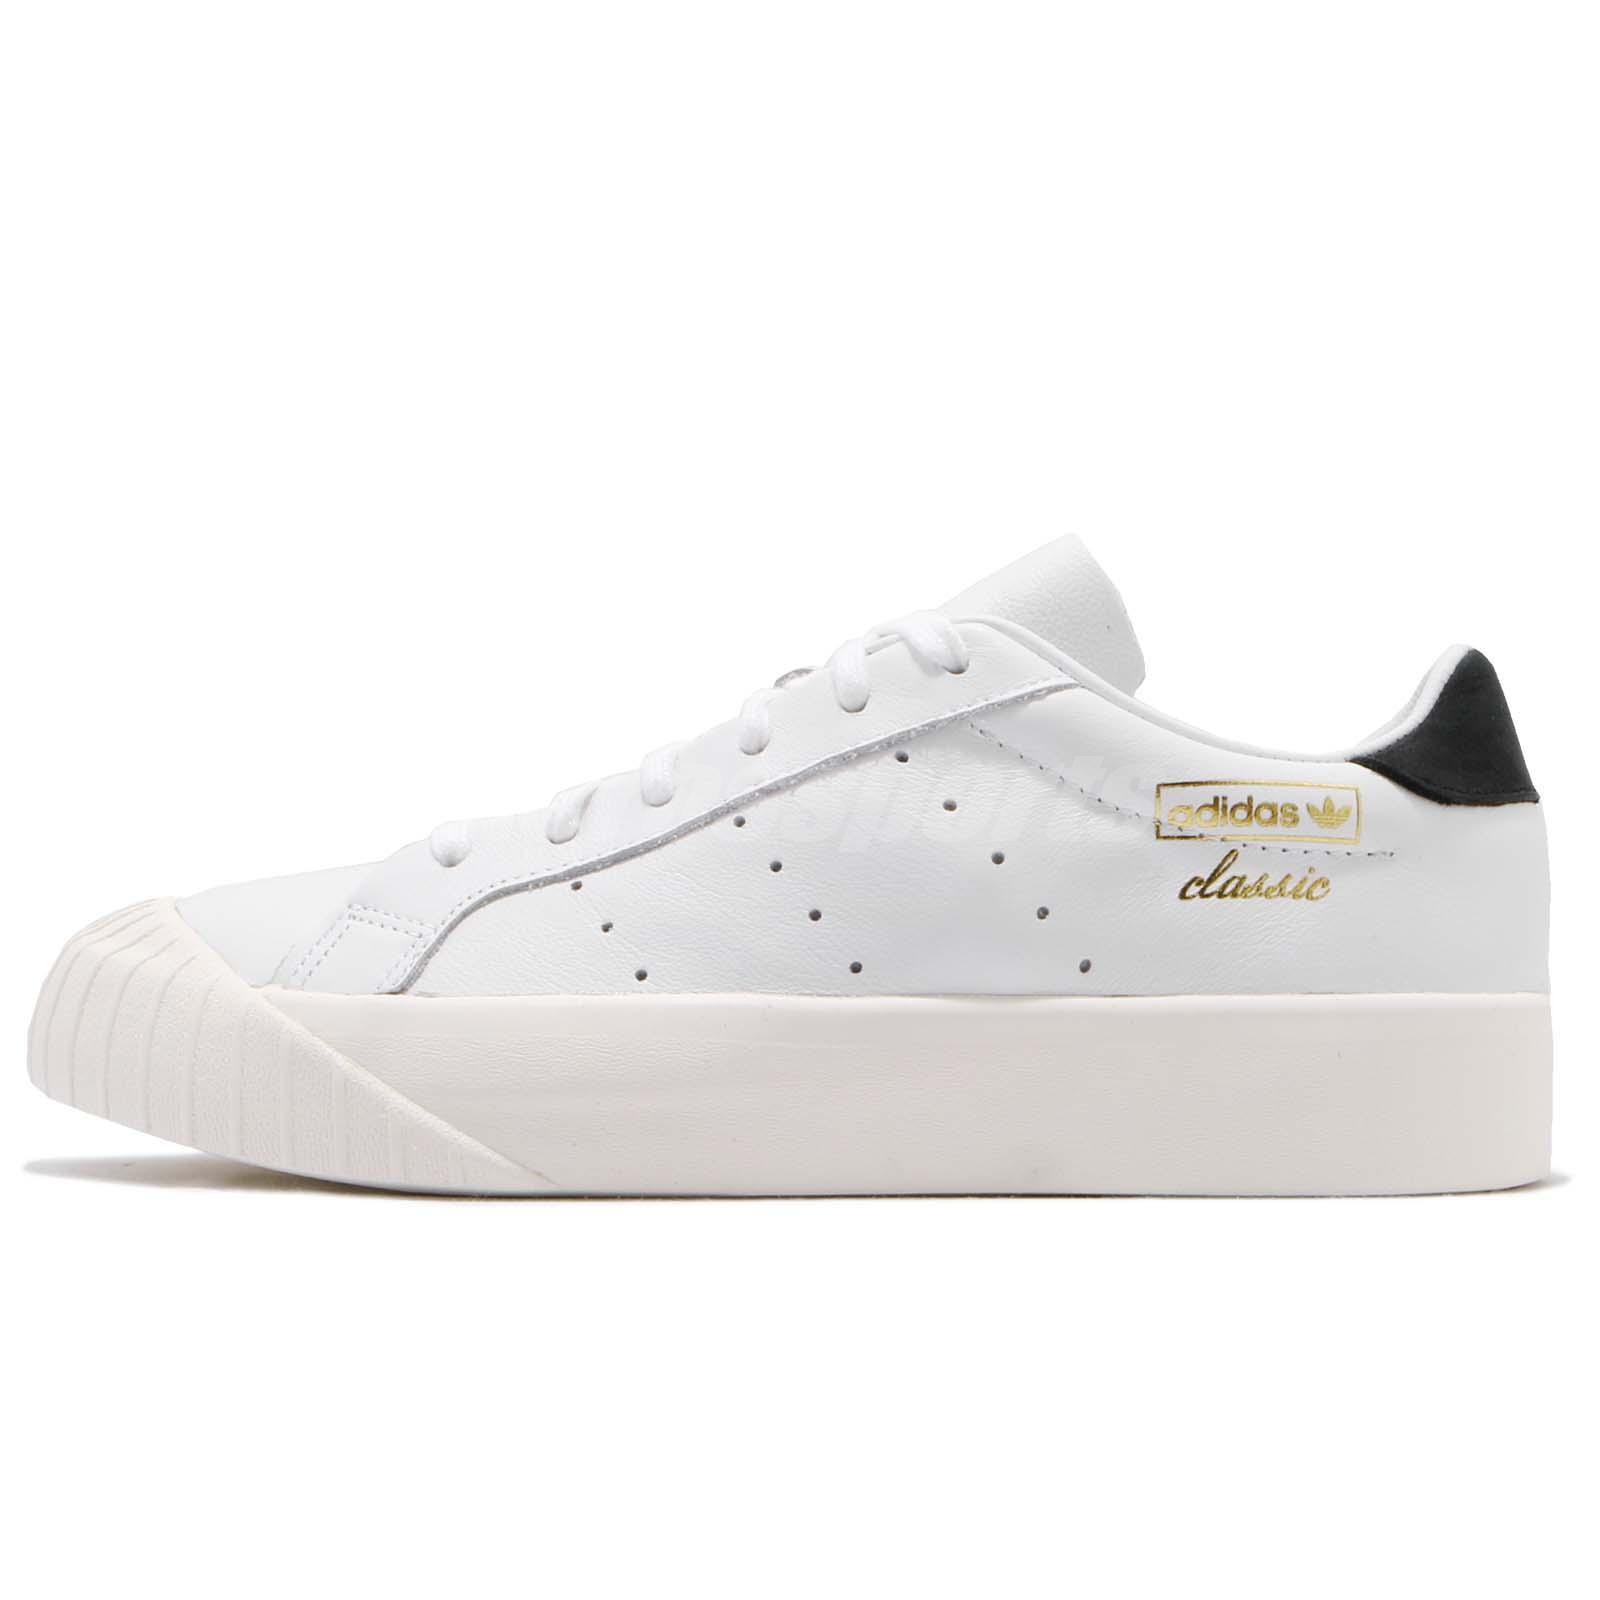 reputable site 5b787 049bb adidas Originals EVERYN W Classic Footwear White Black Women Casual Shoes  CQ2042